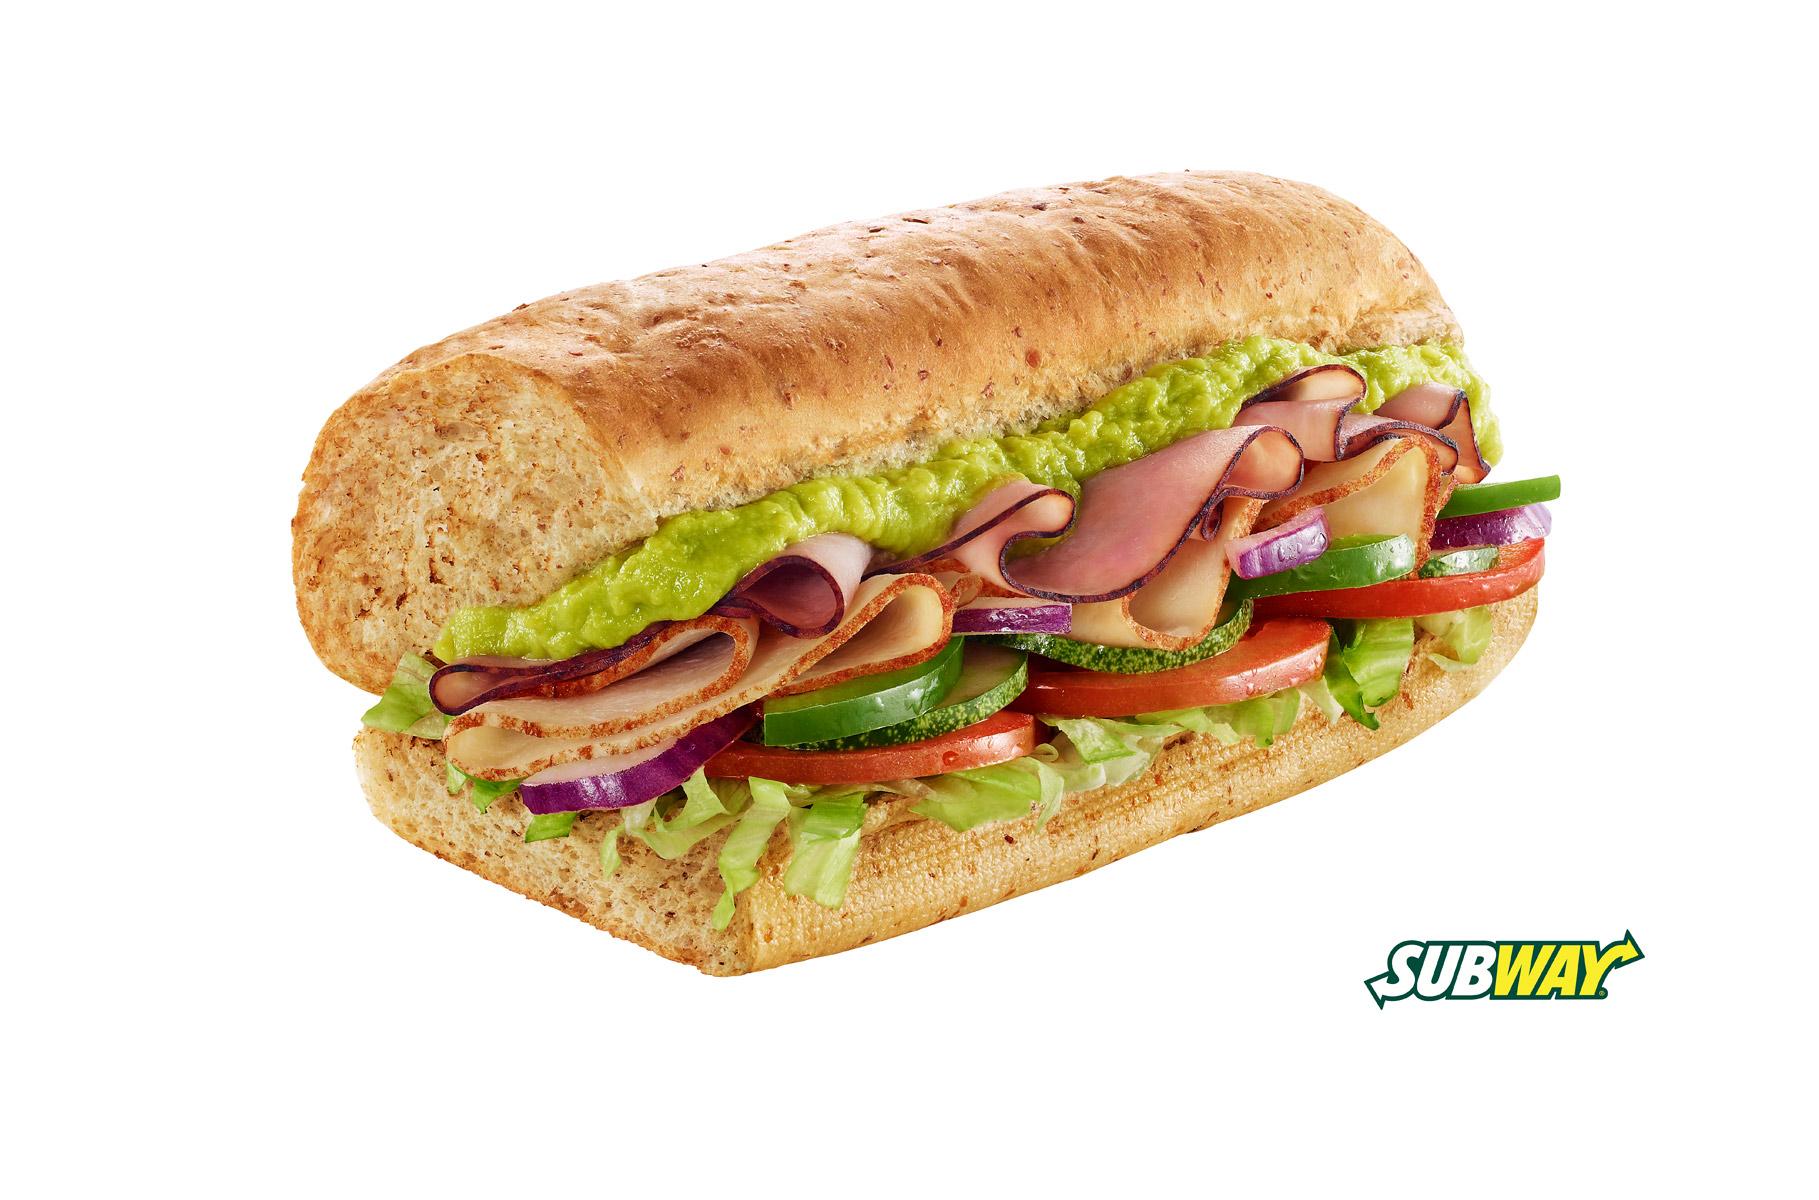 Subway-Turkey-Ham-and-avacado-with-logo.jpg